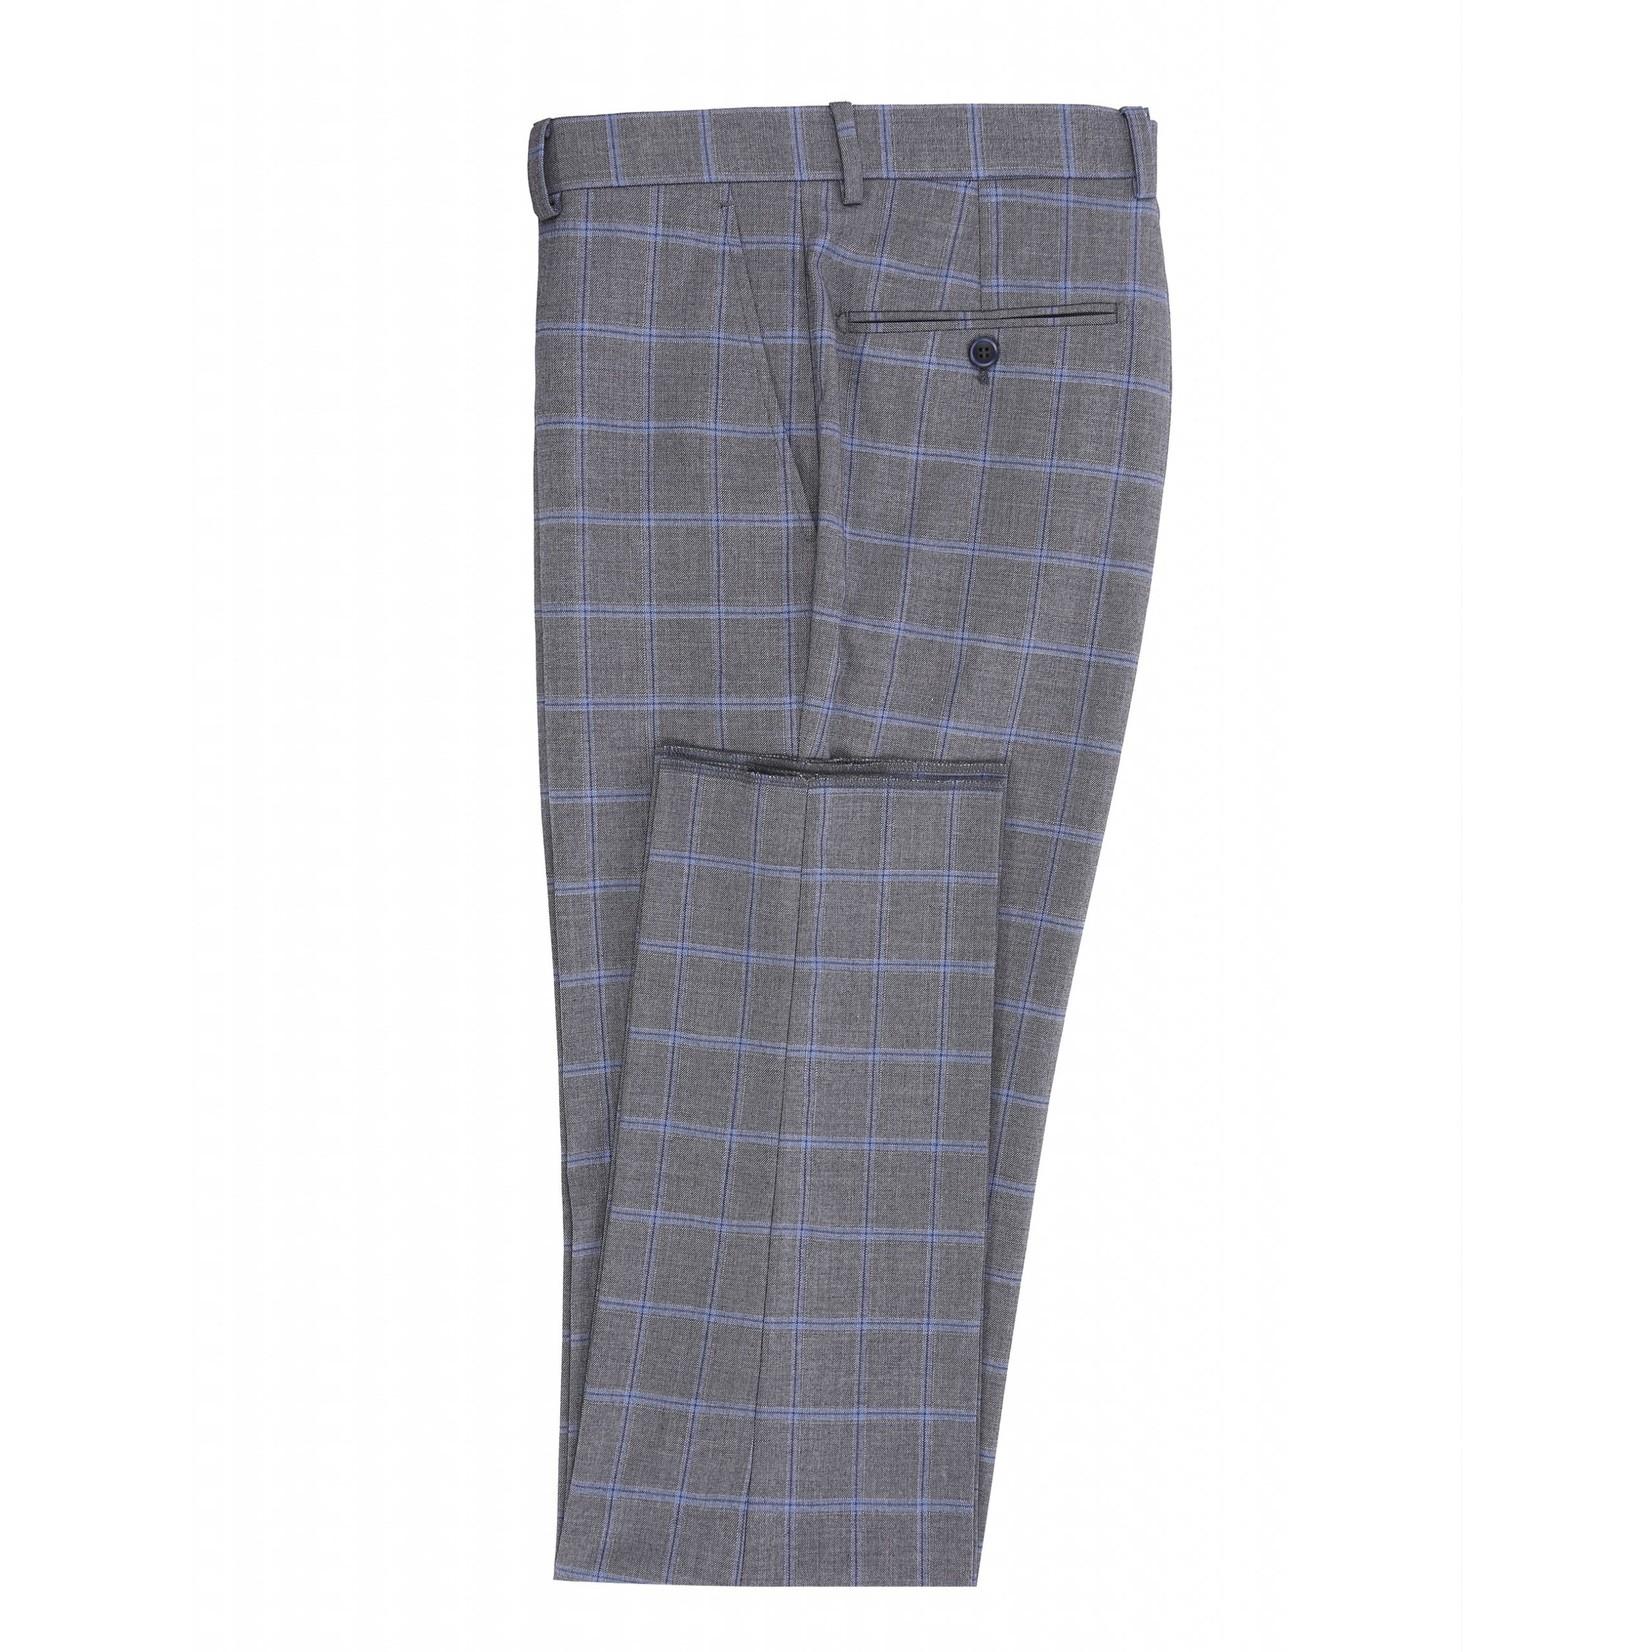 Renoir Renoir Slim Fit Suit 286-7 Grey Windowpane